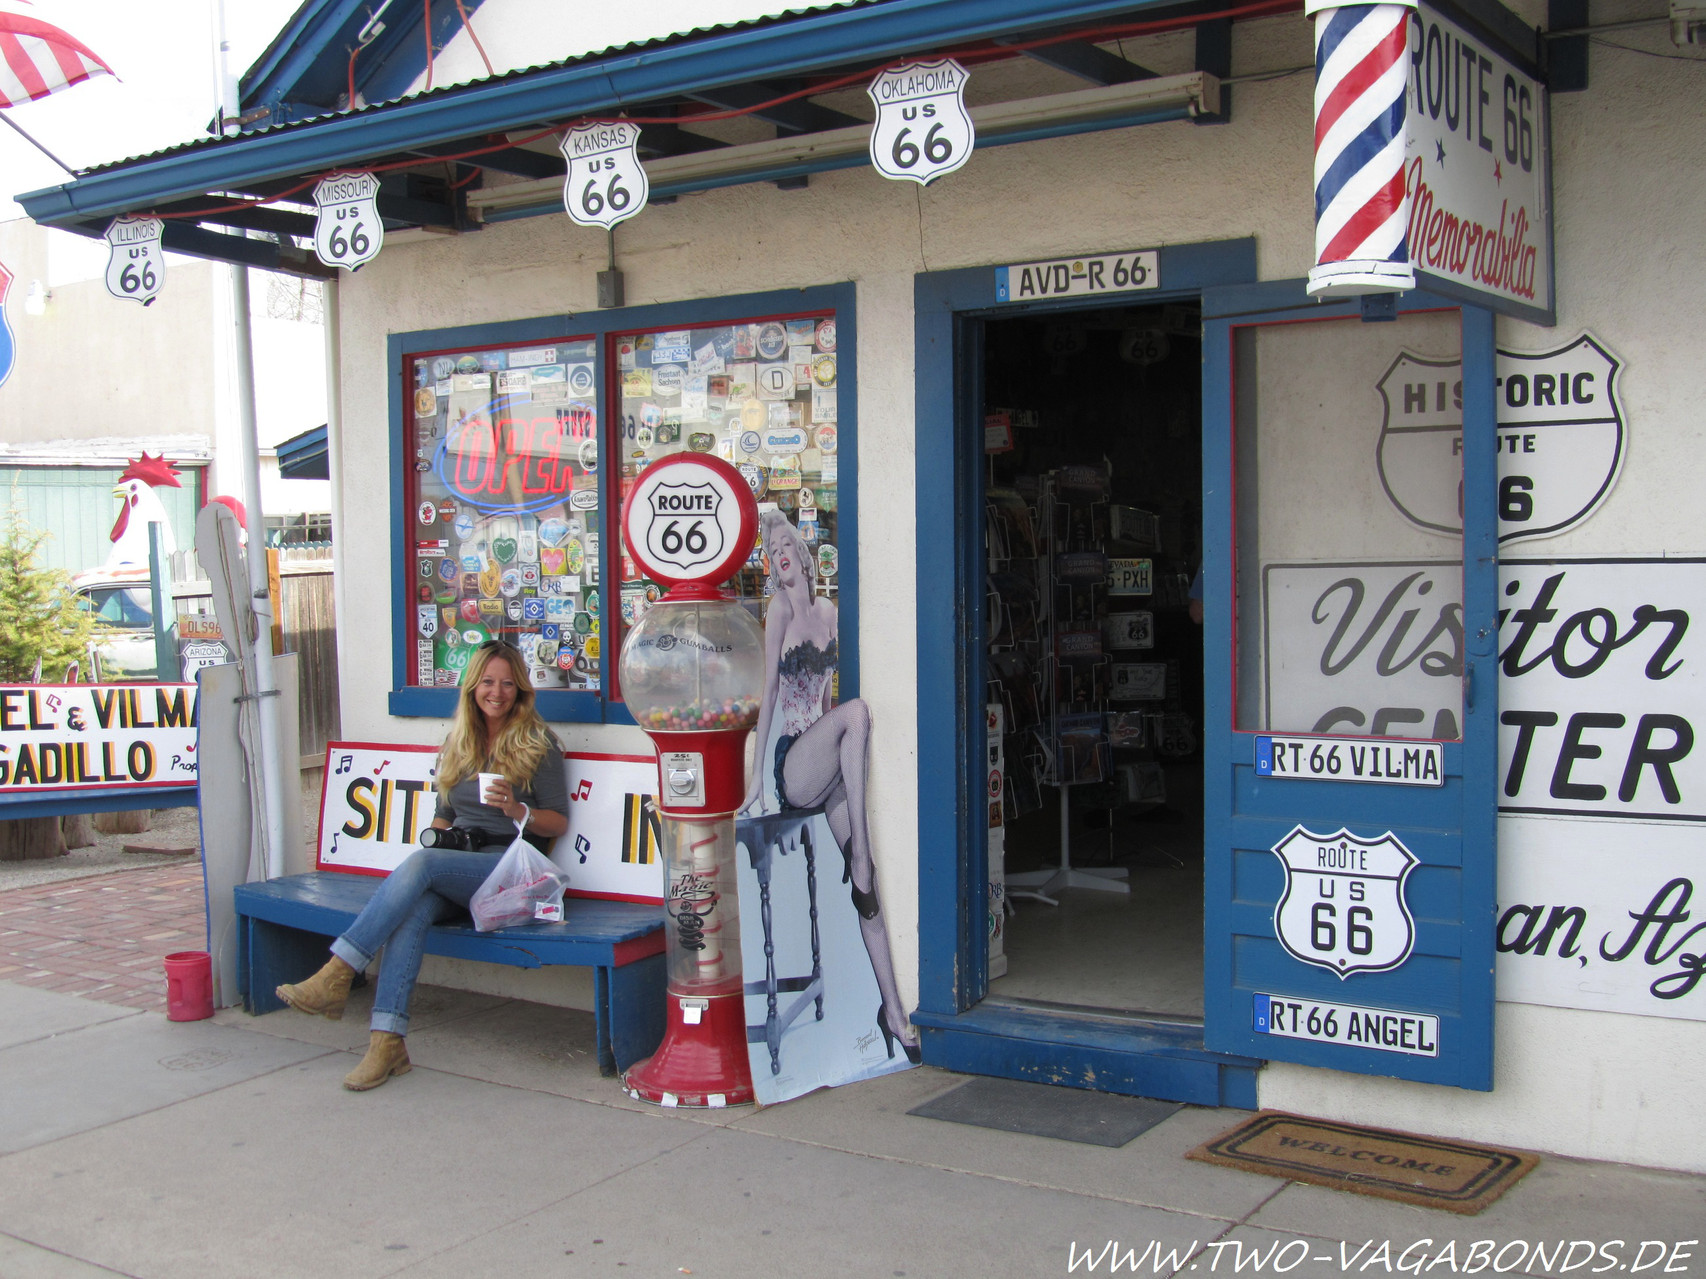 USA 2011 - ROUTE 66